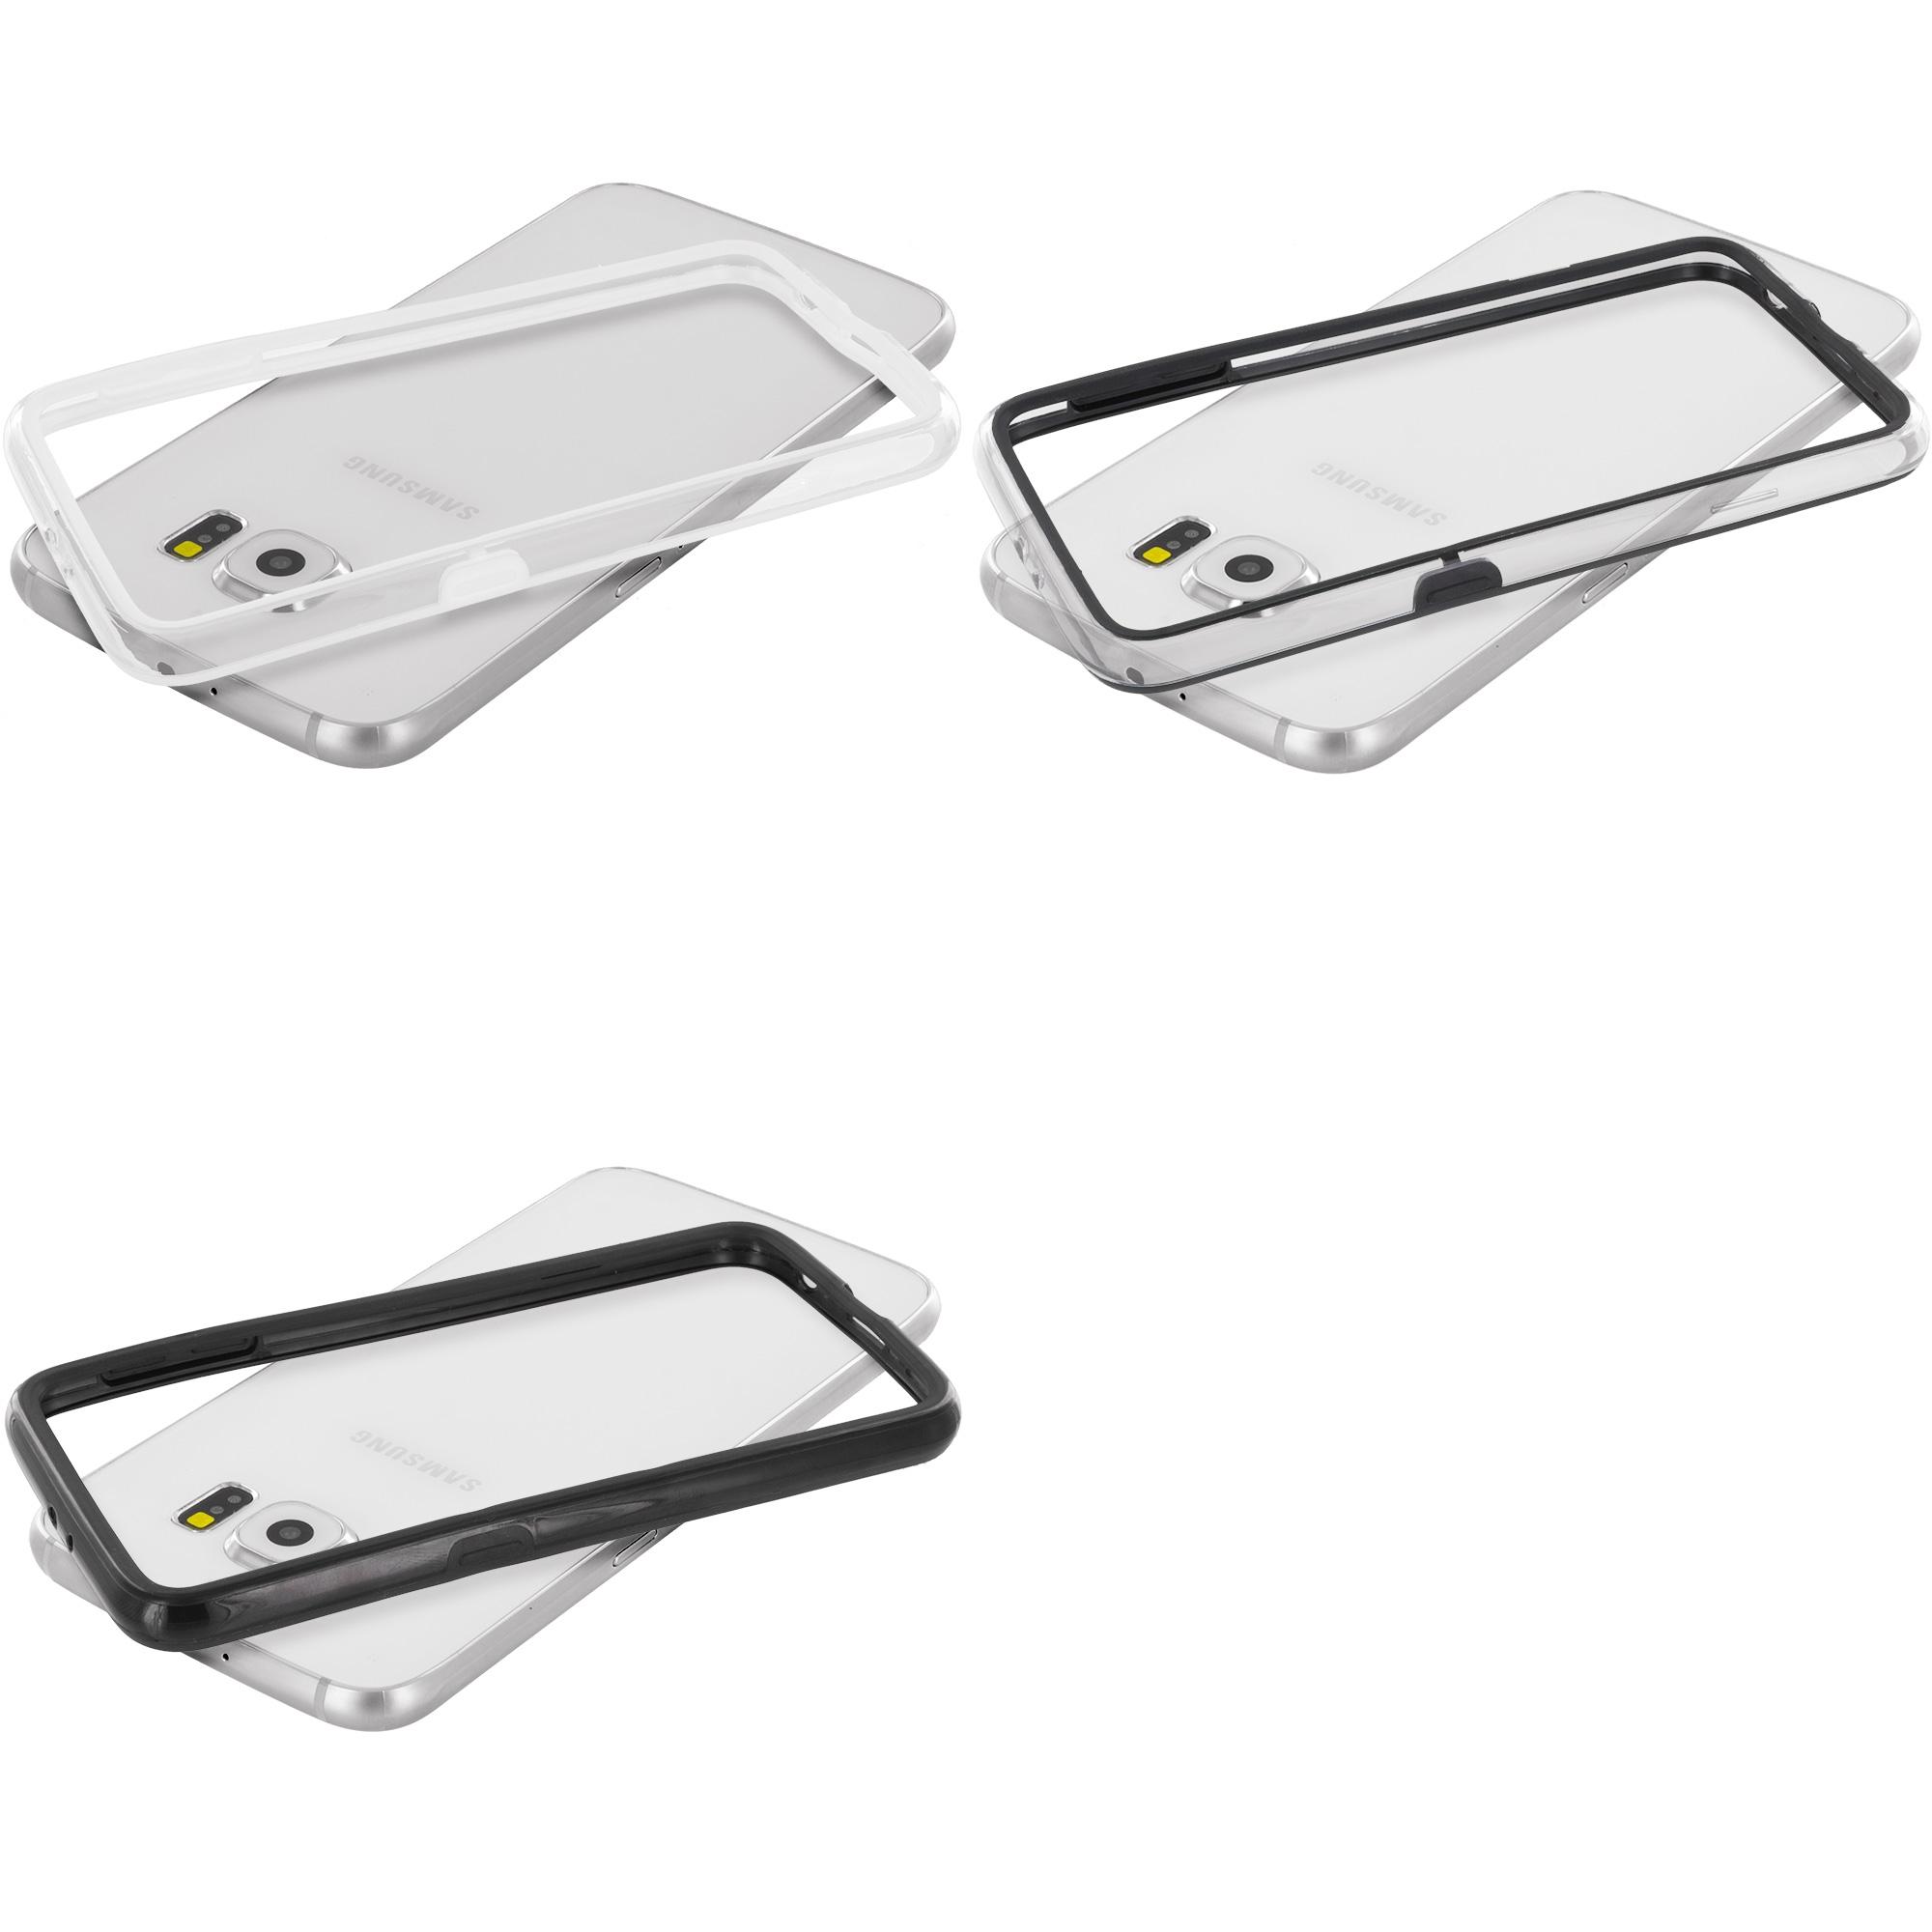 Samsung Galaxy S6 3 in 1 Combo Bundle Pack - TPU Bumper Frame Case Cover